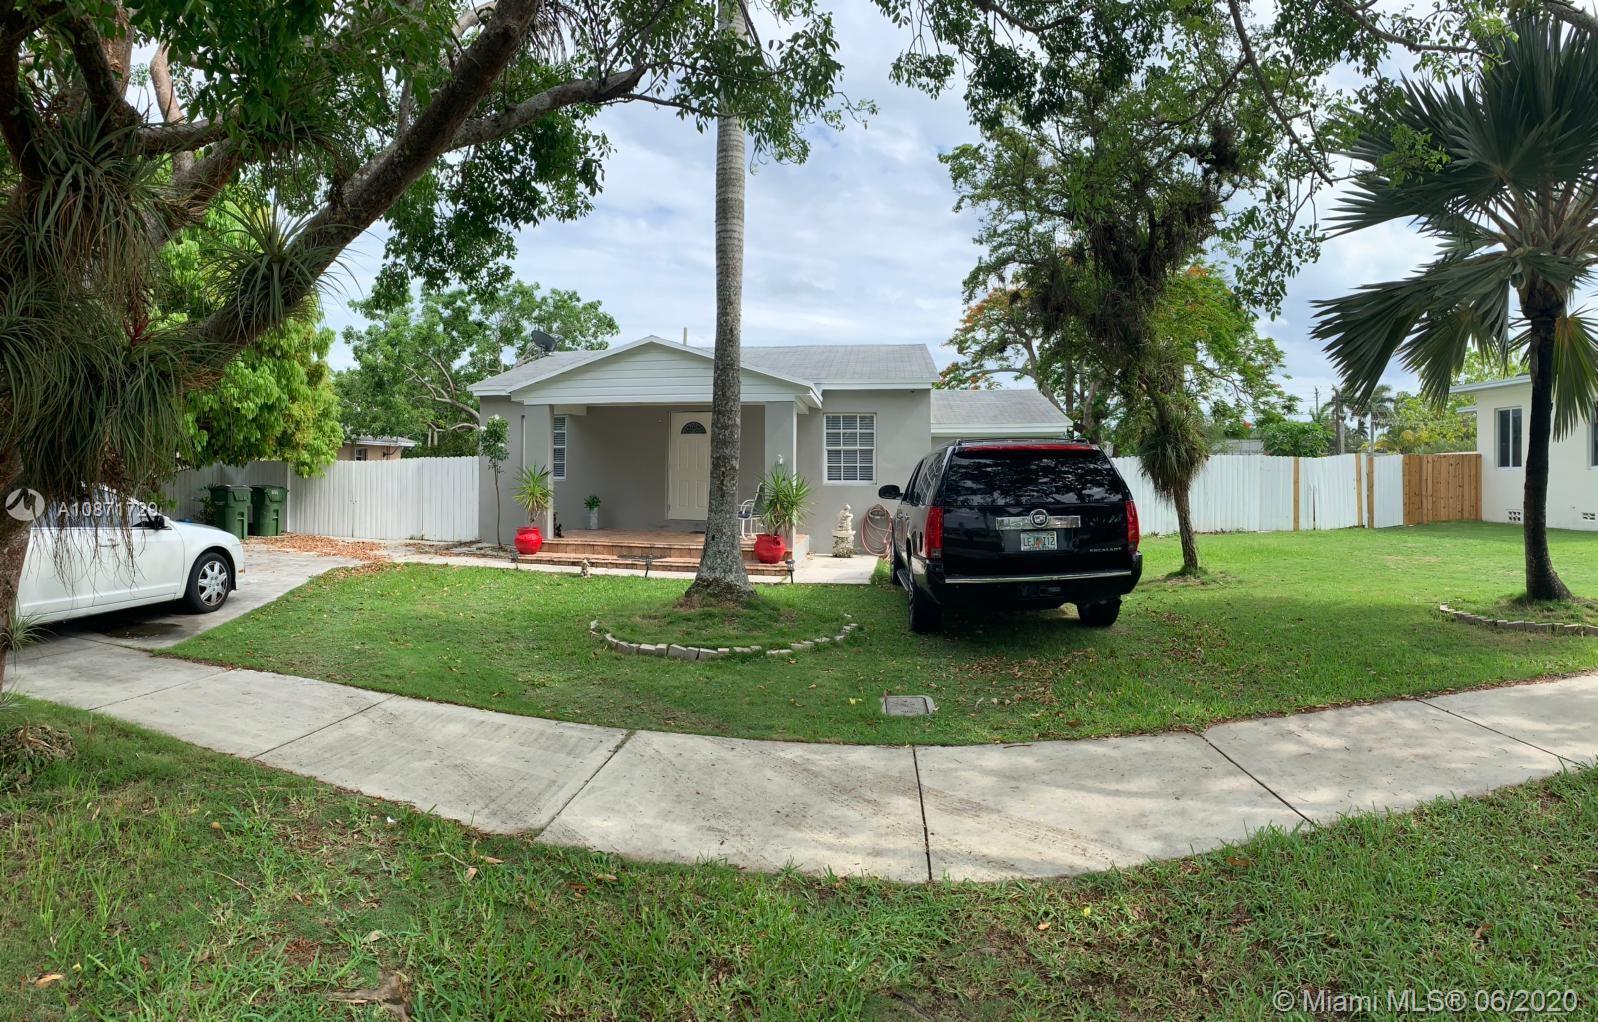 122 NE 18th St Property Photo - Homestead, FL real estate listing